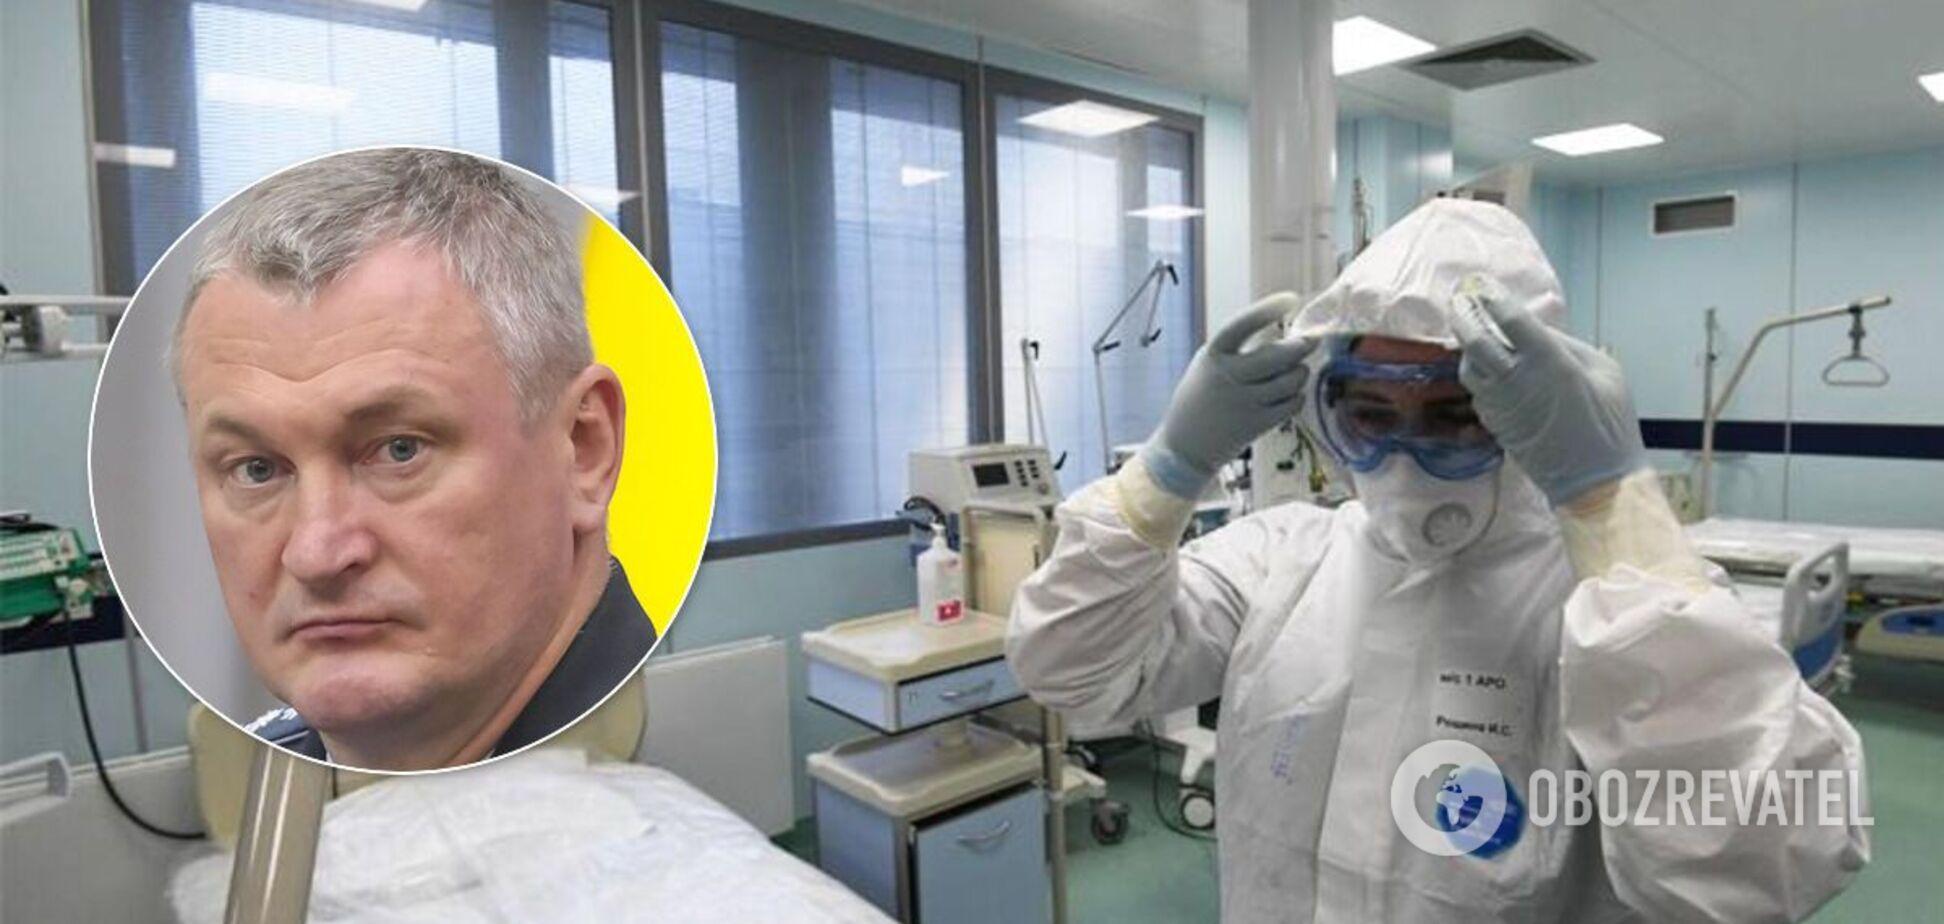 Экс-глава Нацполиции Князев госпитализирован с COVID-19 в тяжелом состоянии – СМИ